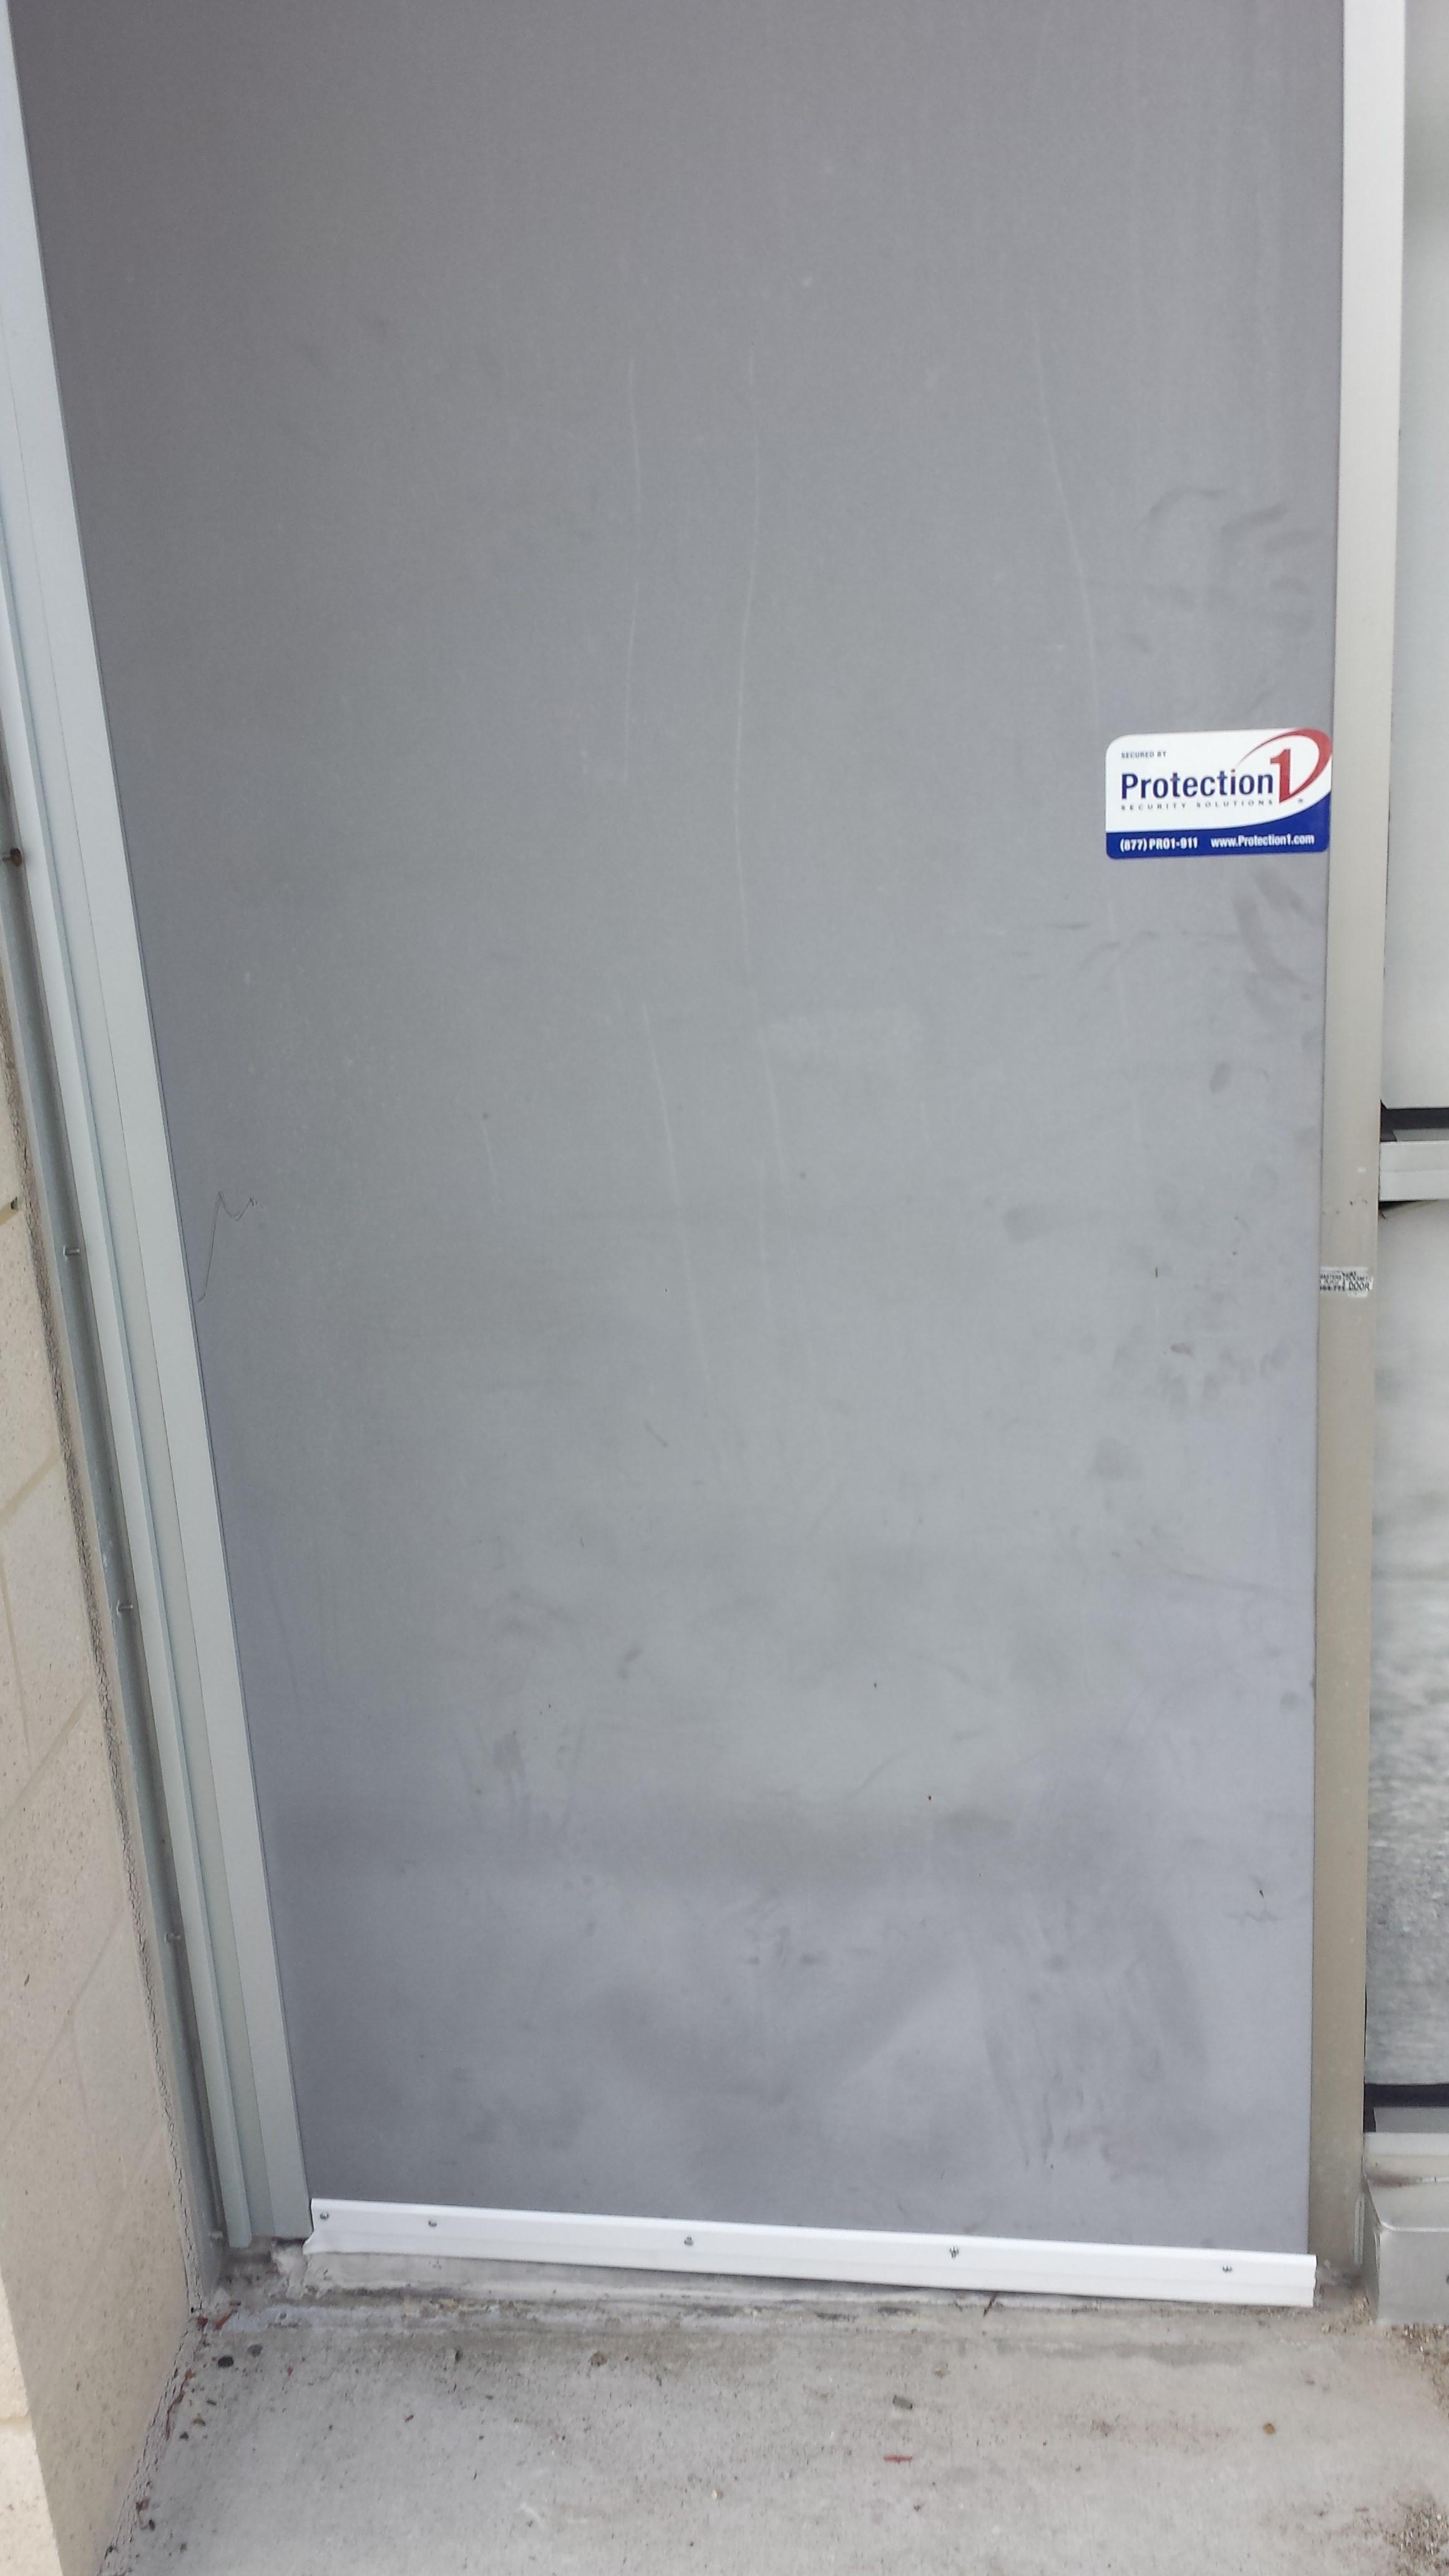 brien of pembroke door wa o doors pines garage parts dark seal seattle replacement new kent repair